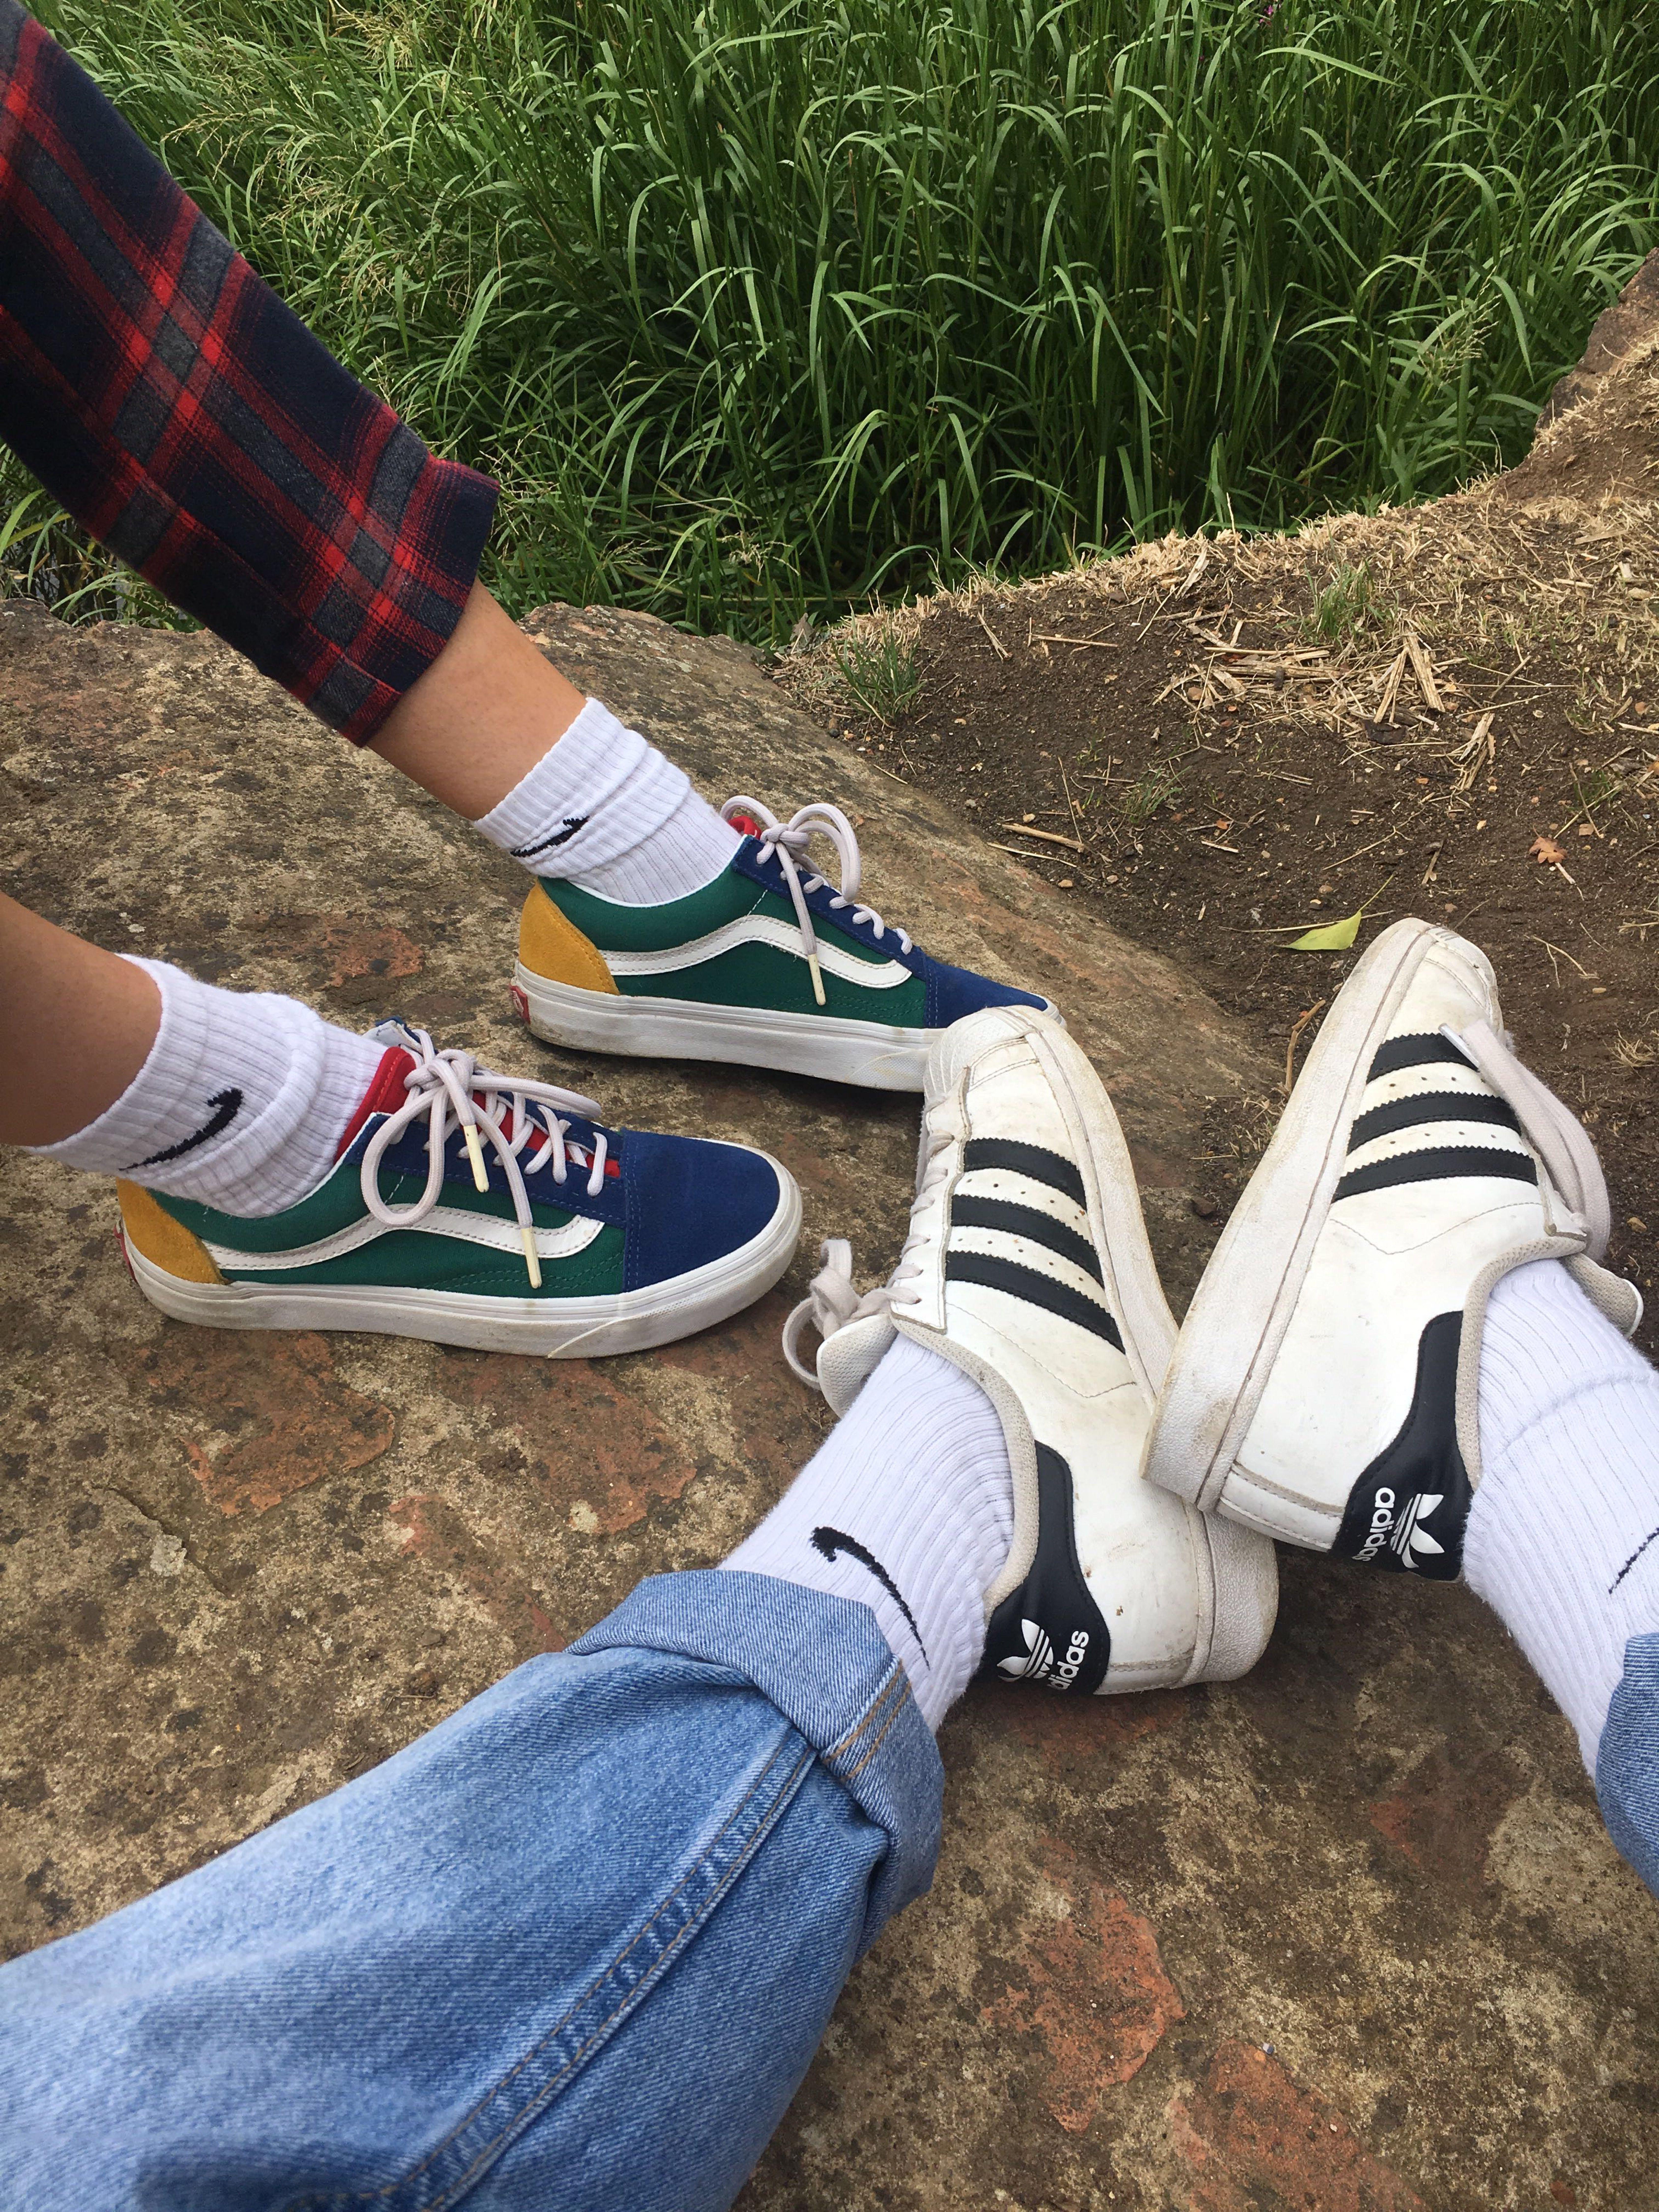 Sneaker, Kleidung, Accessoires | Online Shop ☆ ☆